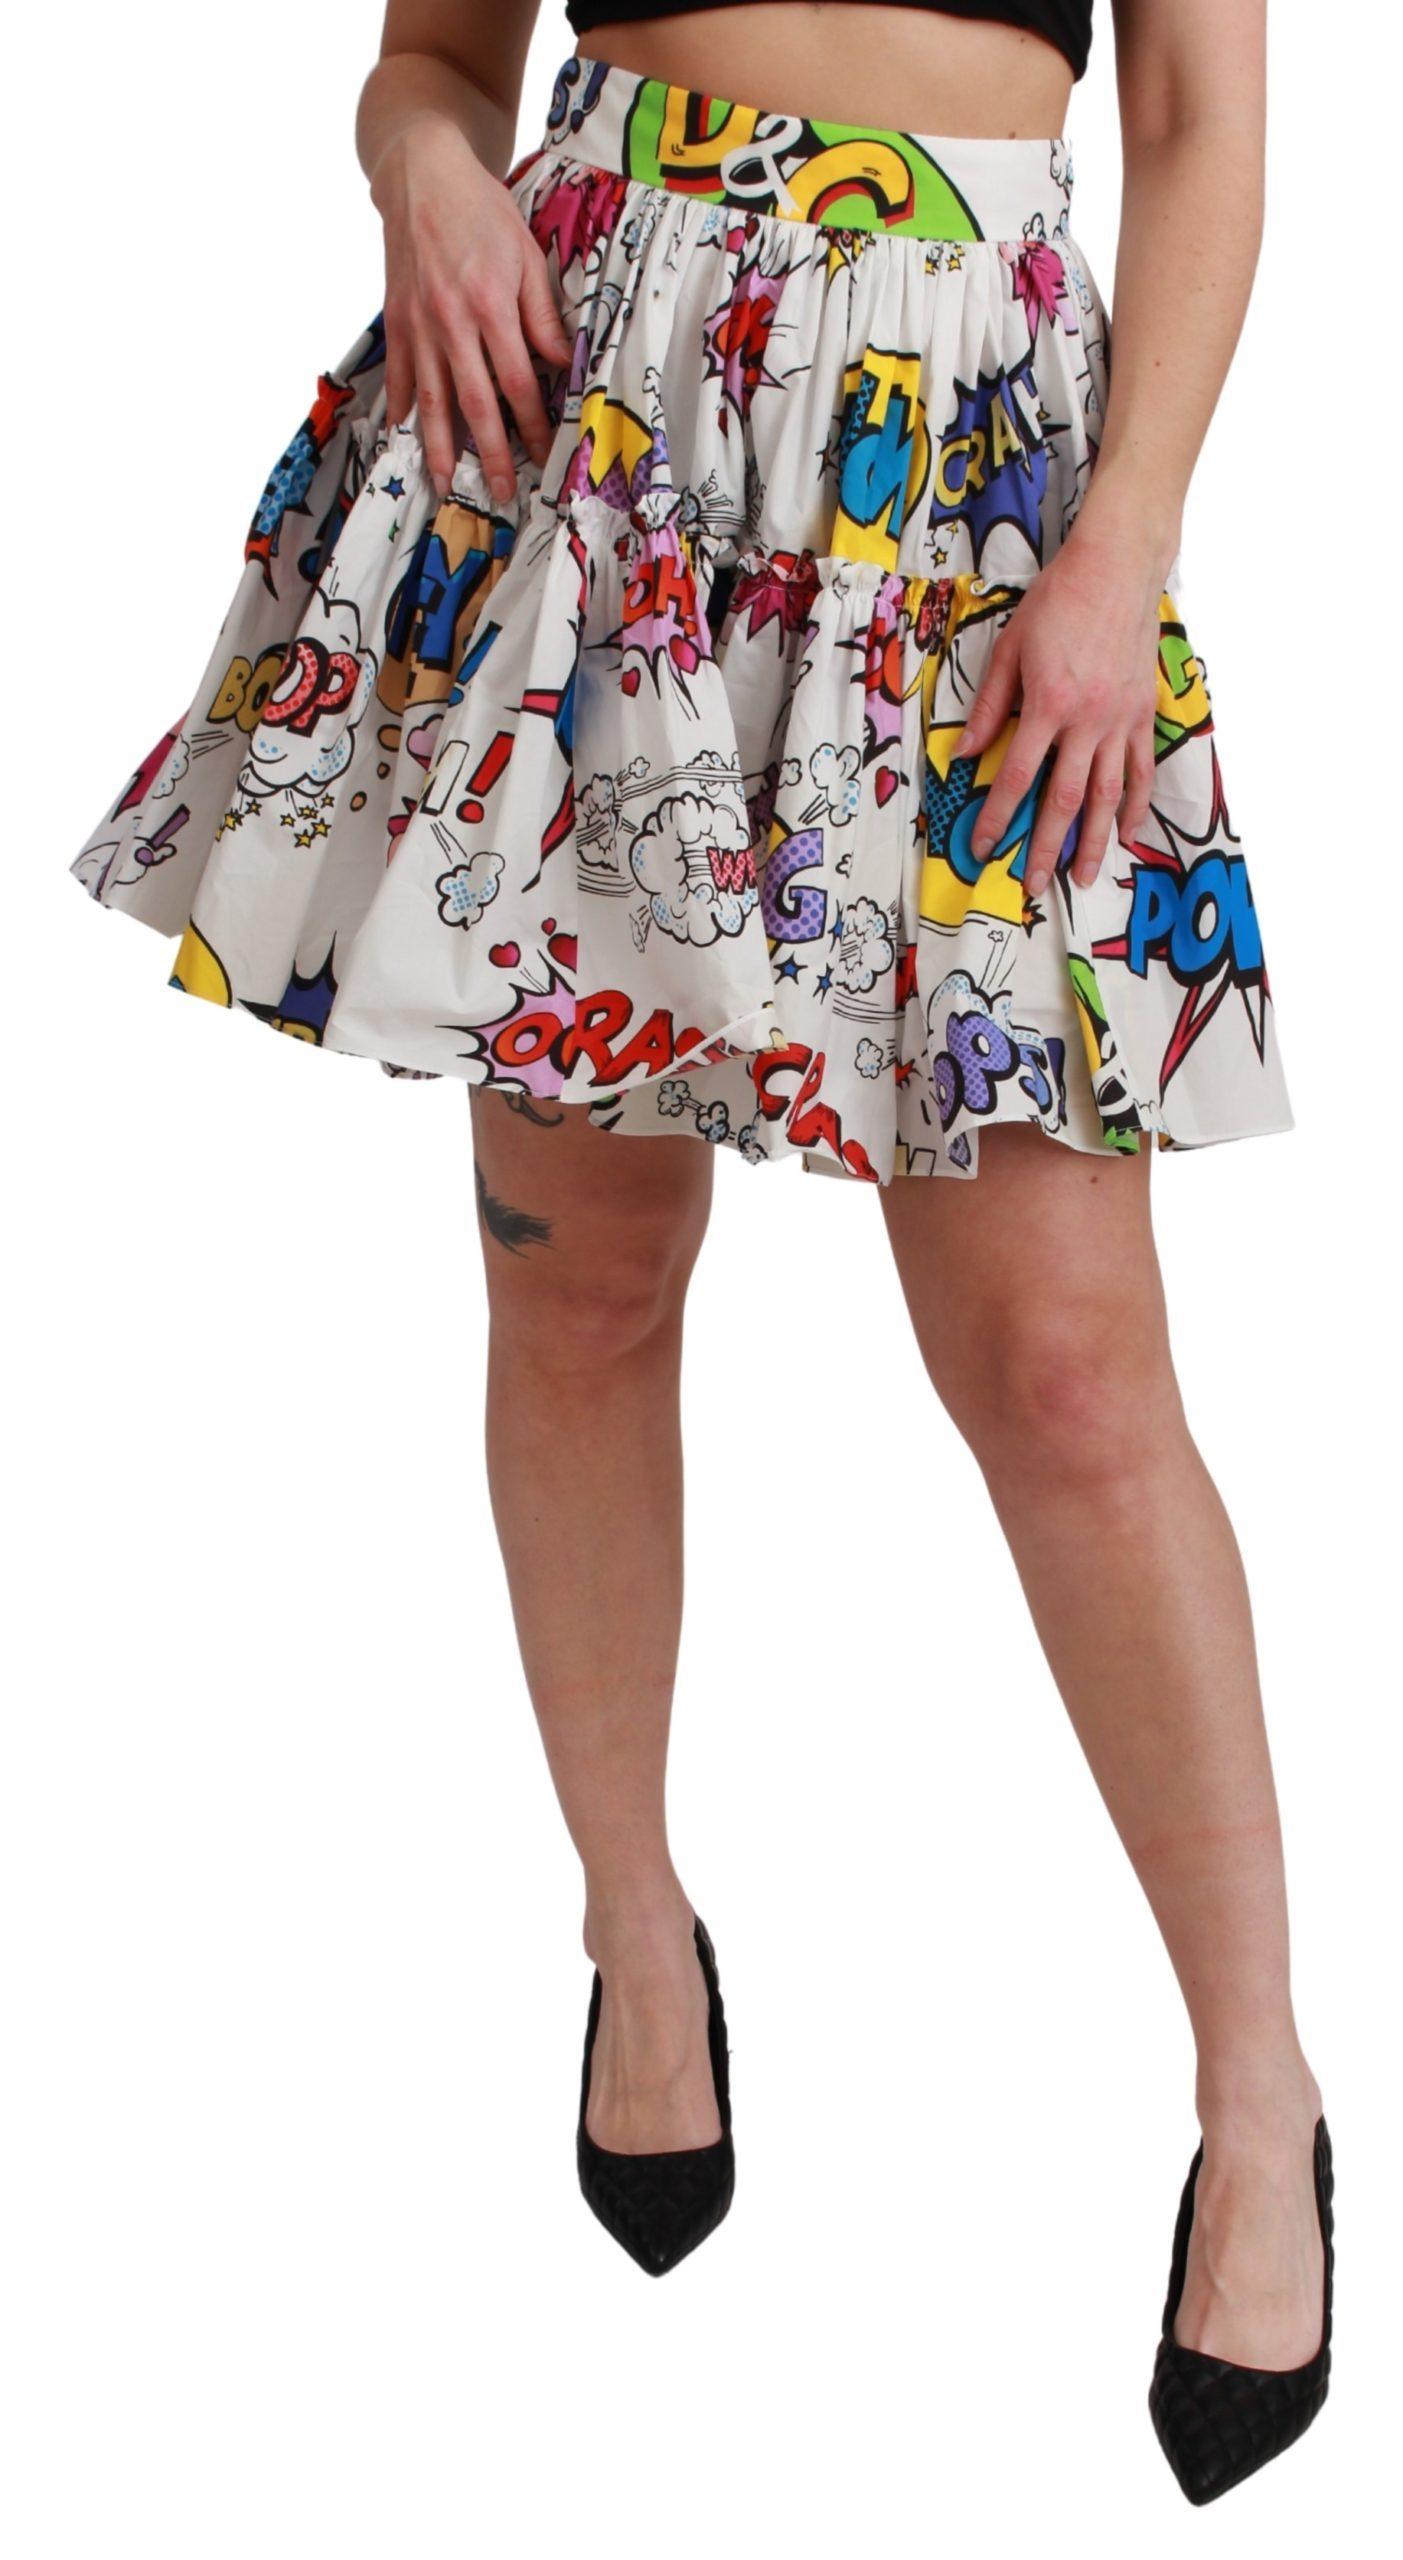 Dolce & Gabbana Women's Waist A-line Mini Cartoon Skirt SKI1438 - IT36 | XS